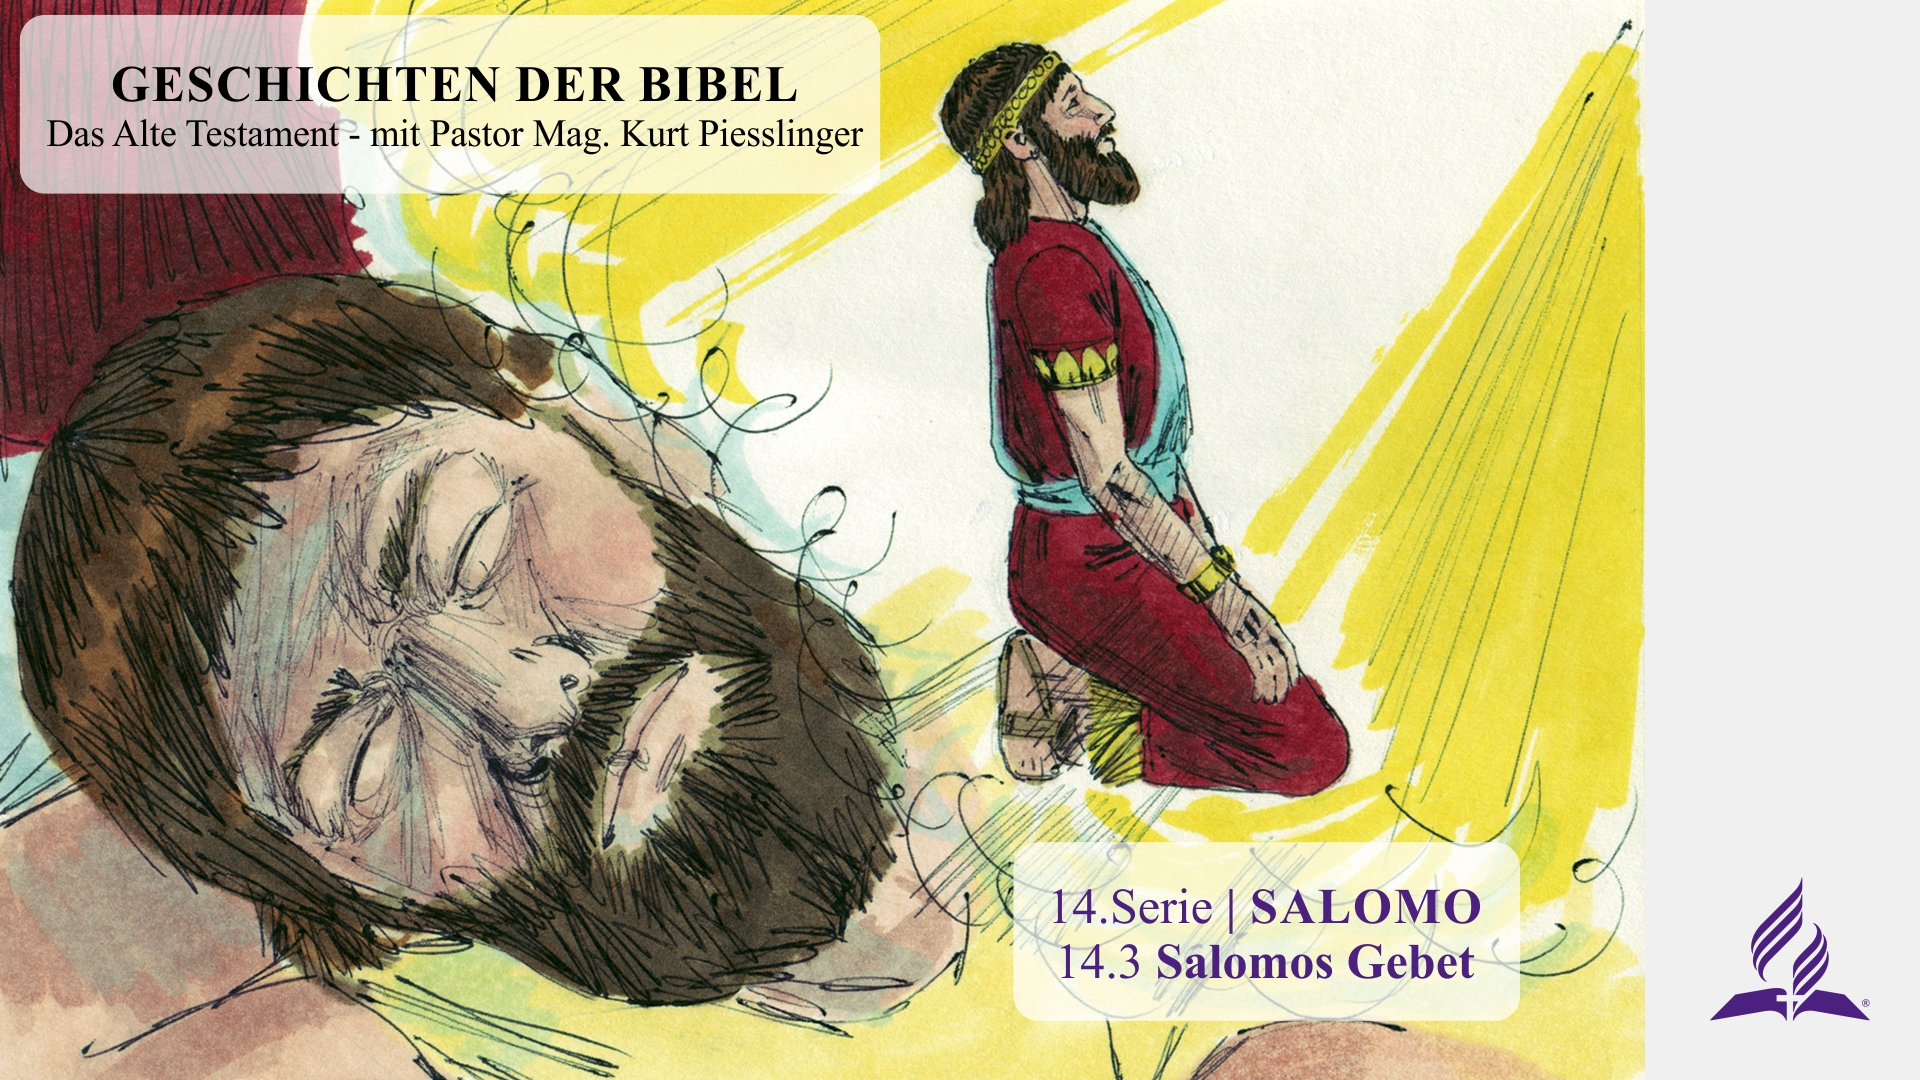 14.3 Salomos Gebet x